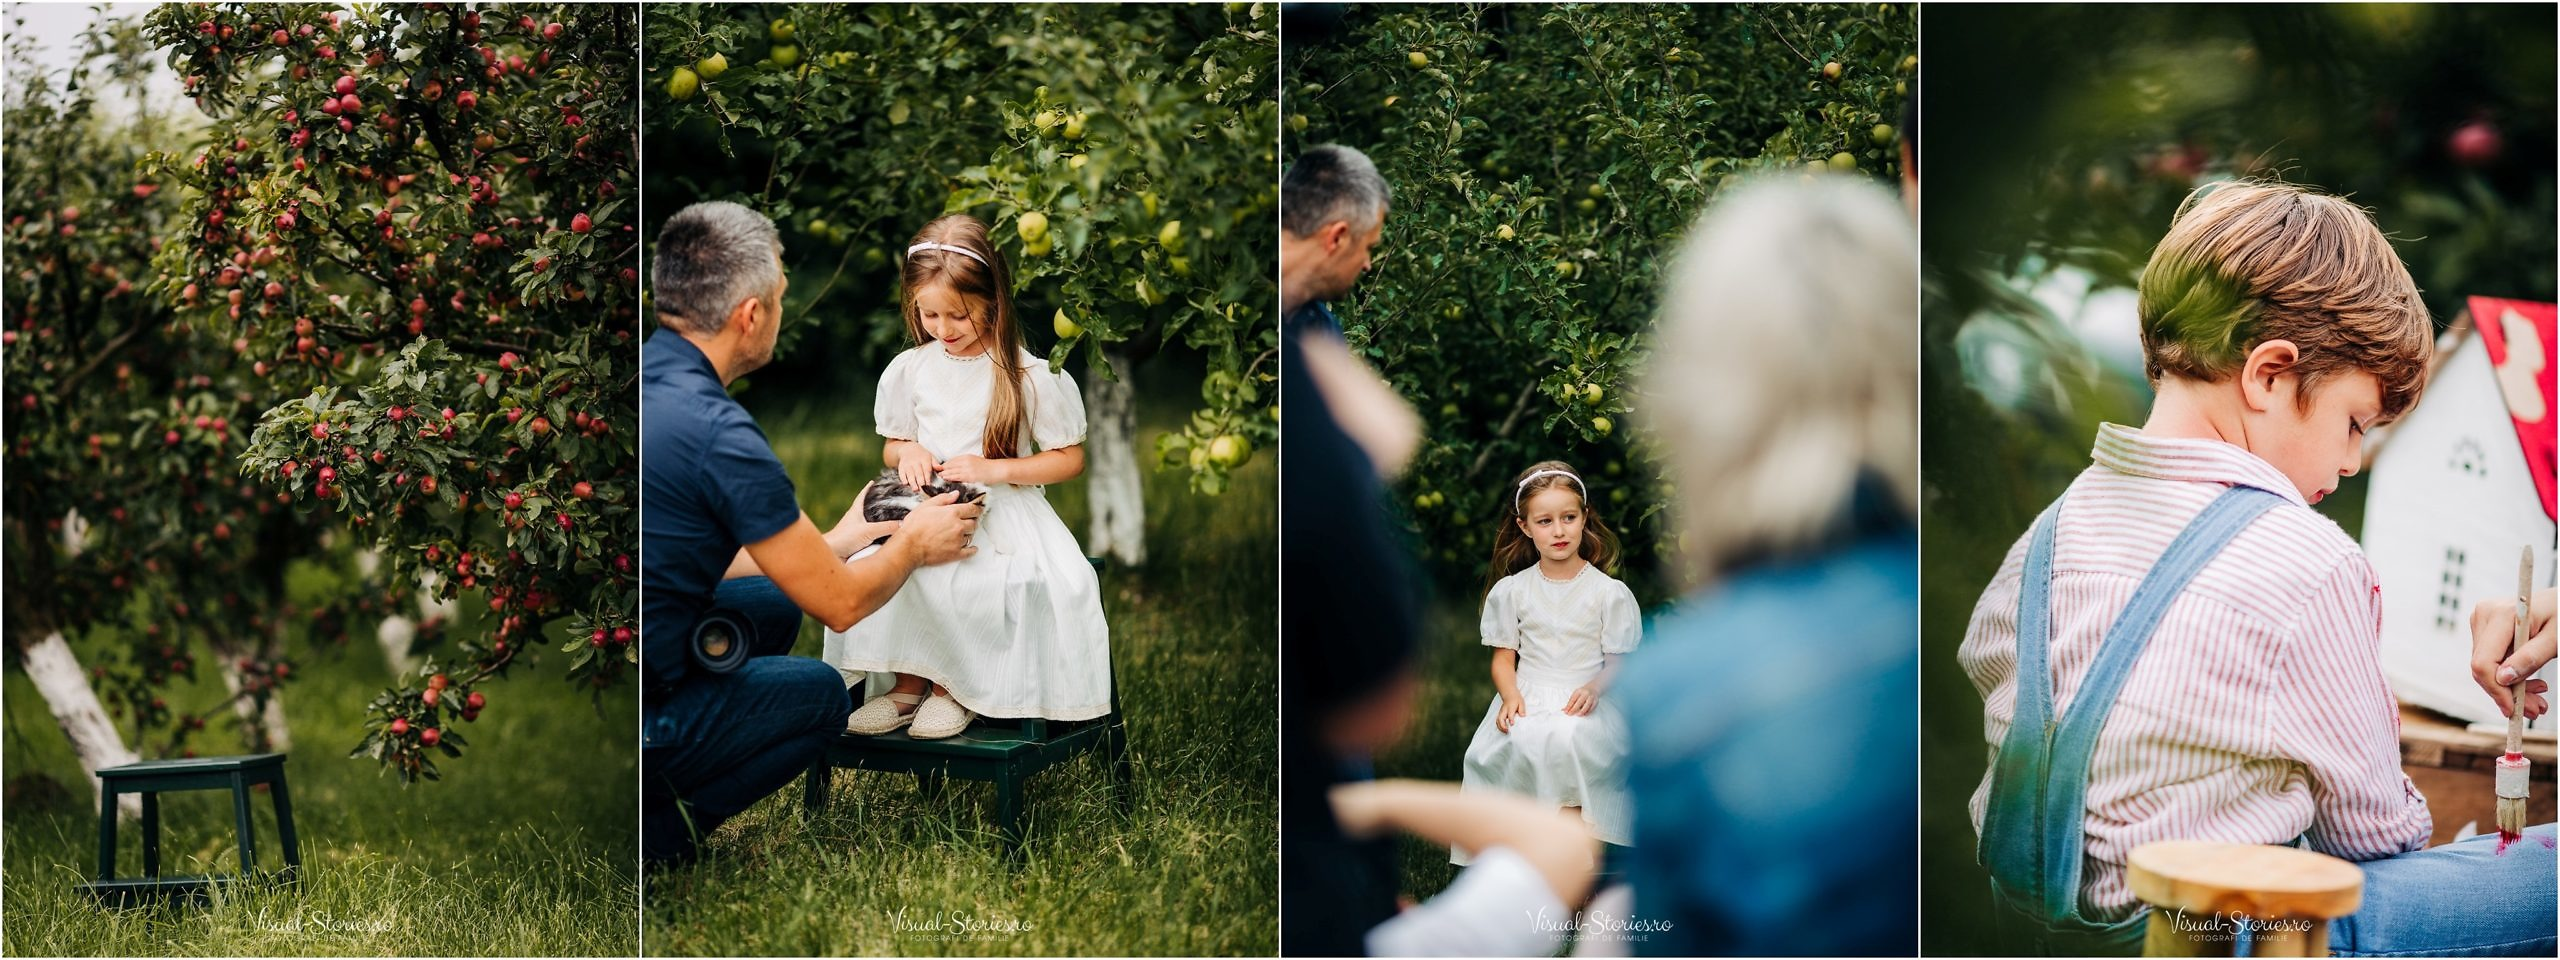 Family Retreat Sibiu